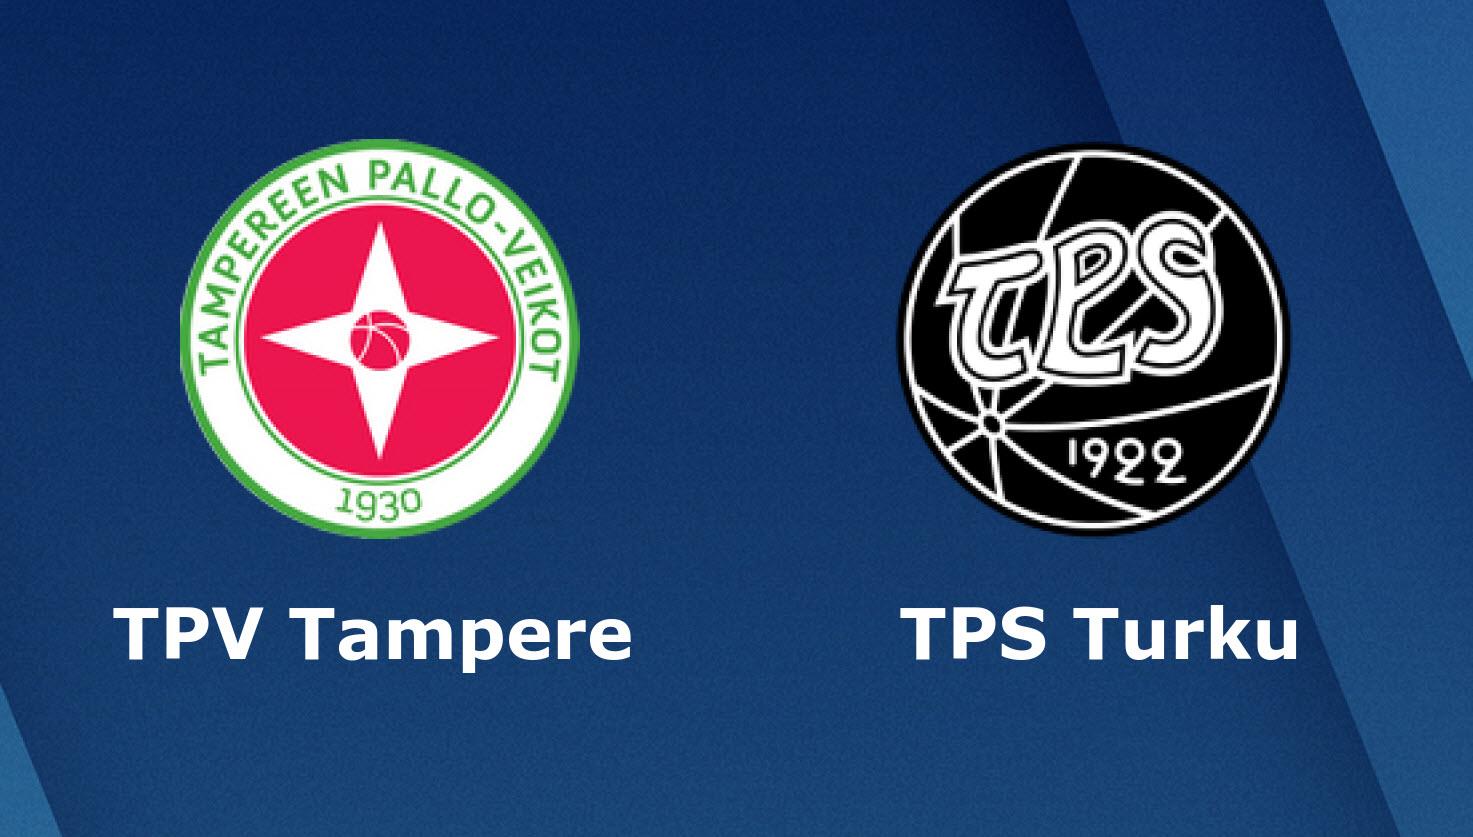 tampere-vs-tps-turku-22h30-ngay-02-07